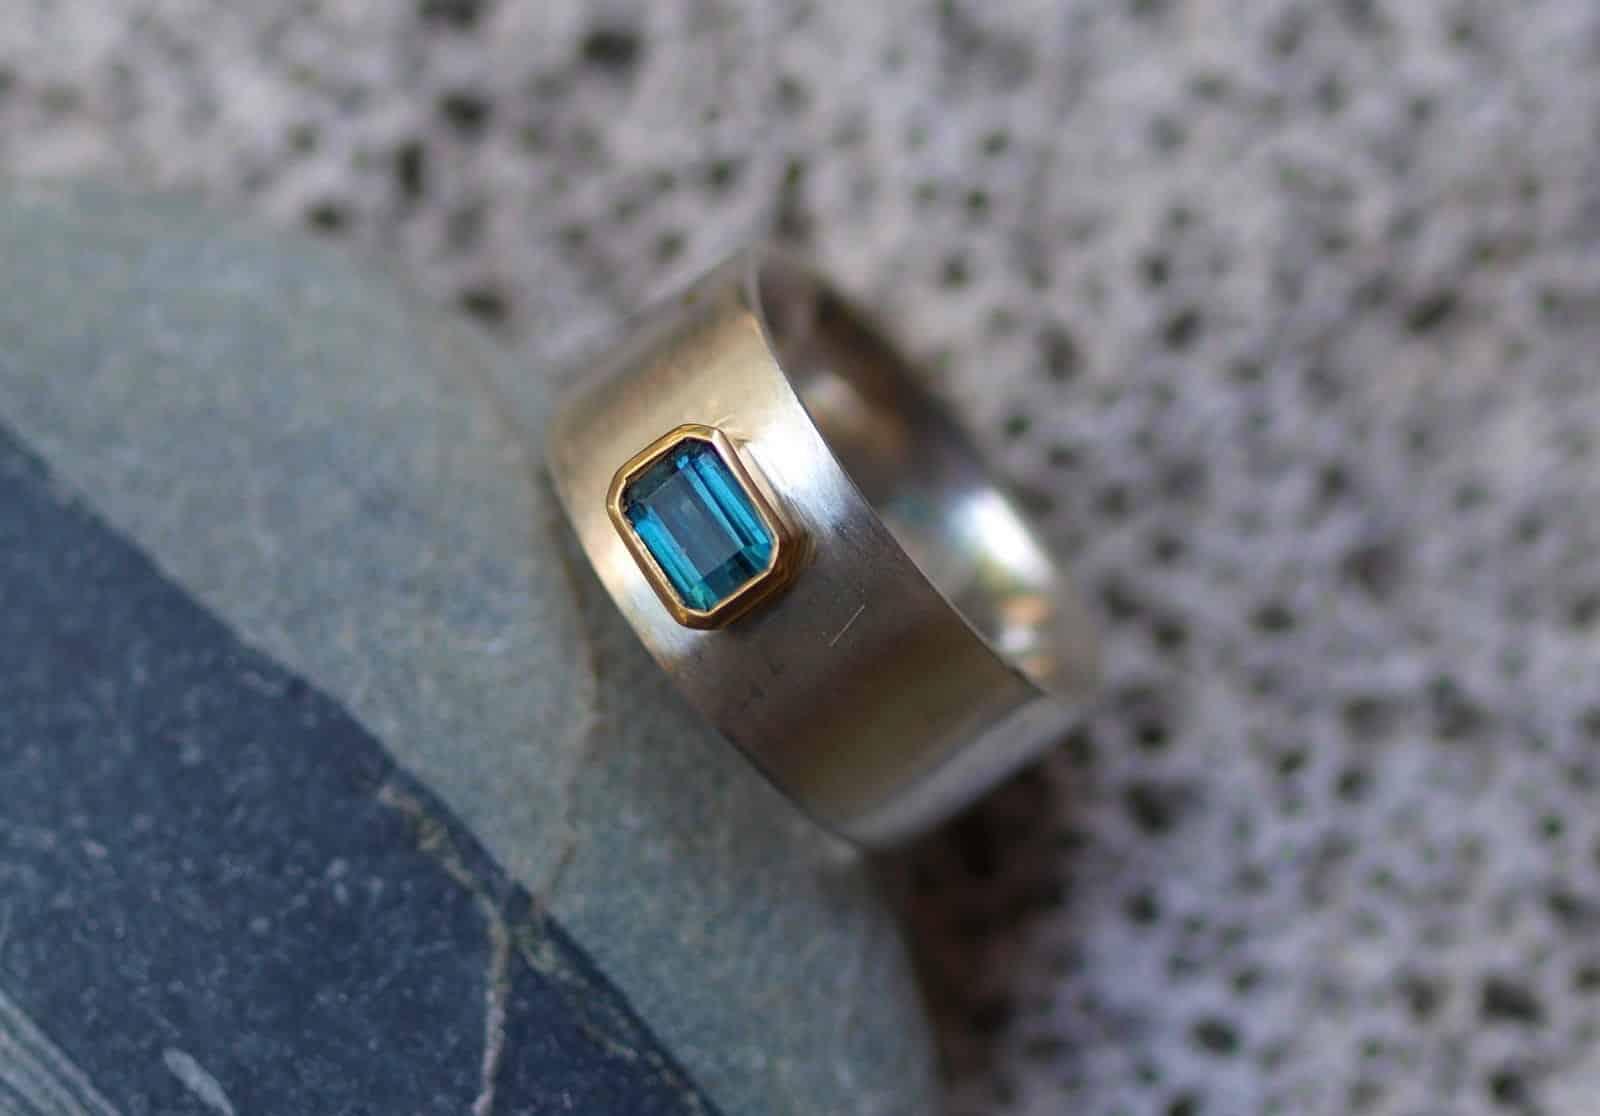 Designer Ring Silber 925 Gold 750 Turmalin Indigolith 0,7 ct blau grün Unikat